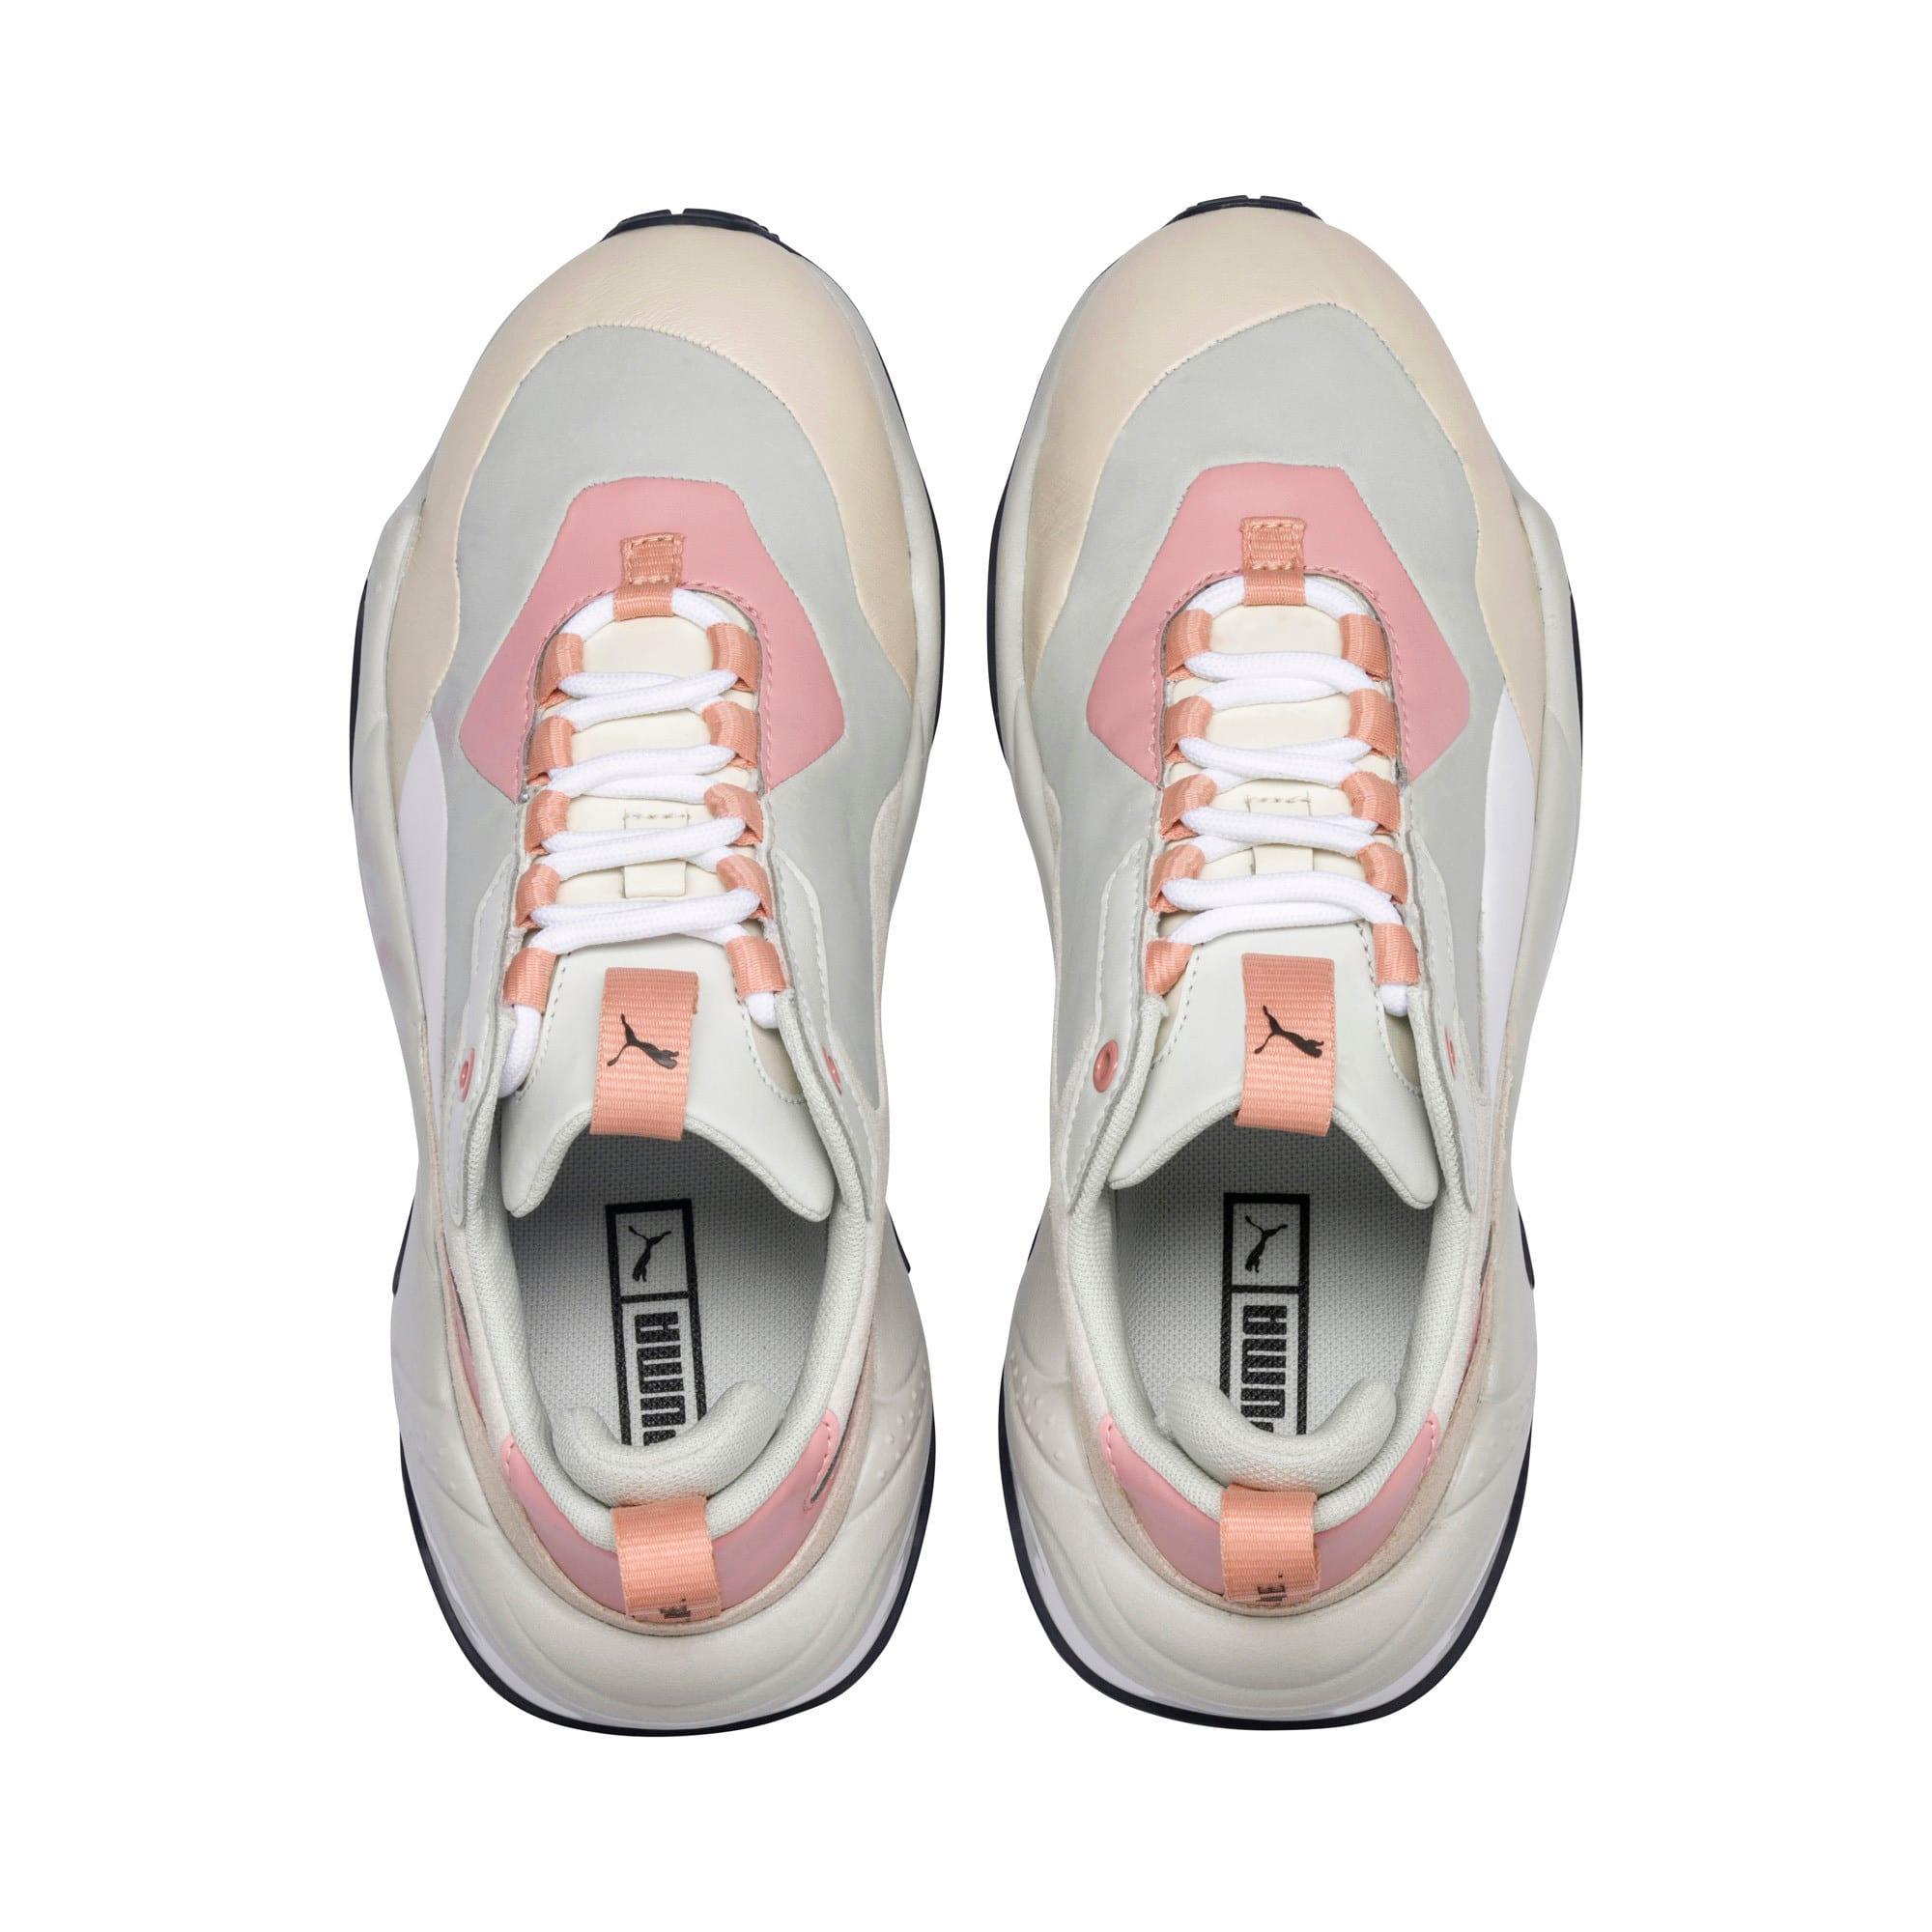 Thumbnail 7 of Thunder Rive Gauche Women's Sneakers, Peach Beige-Glacier Gray, medium